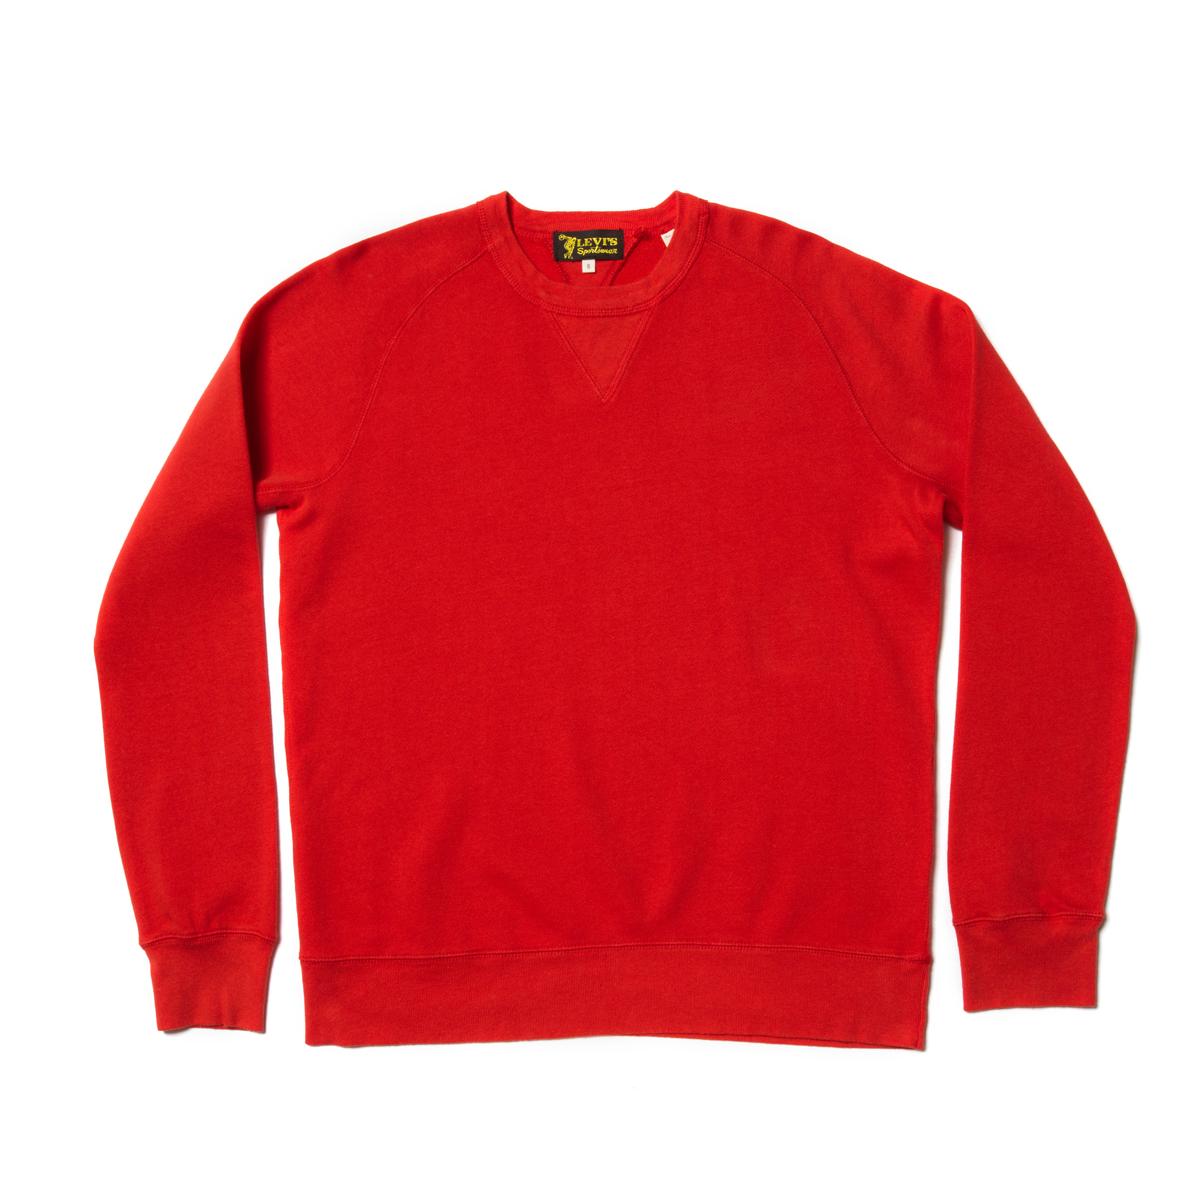 LVC 1950s Crew Sweatshirt £120